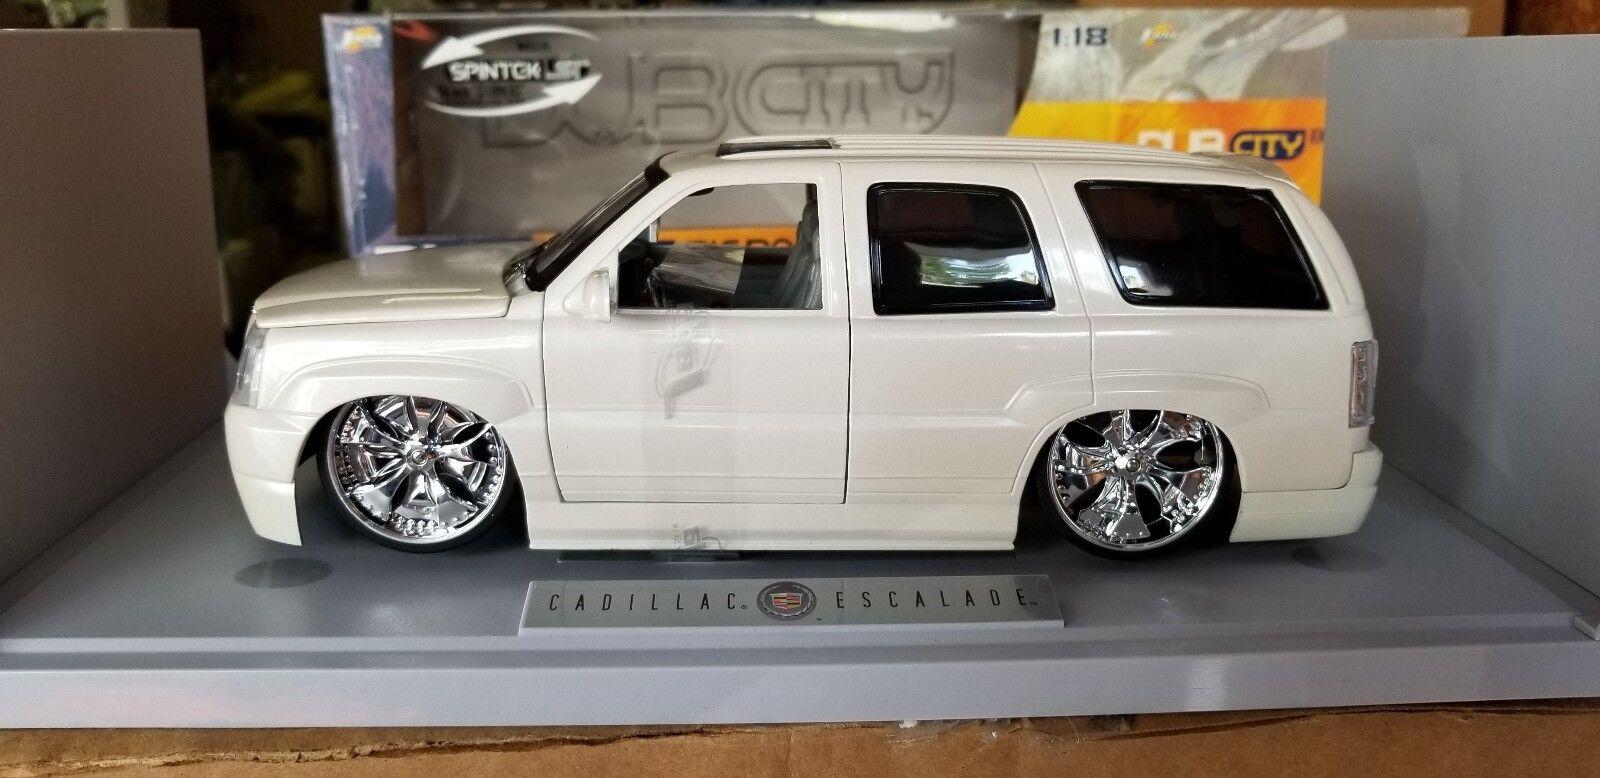 1 18 Jada Toys Cadillac Escalade Dub City White